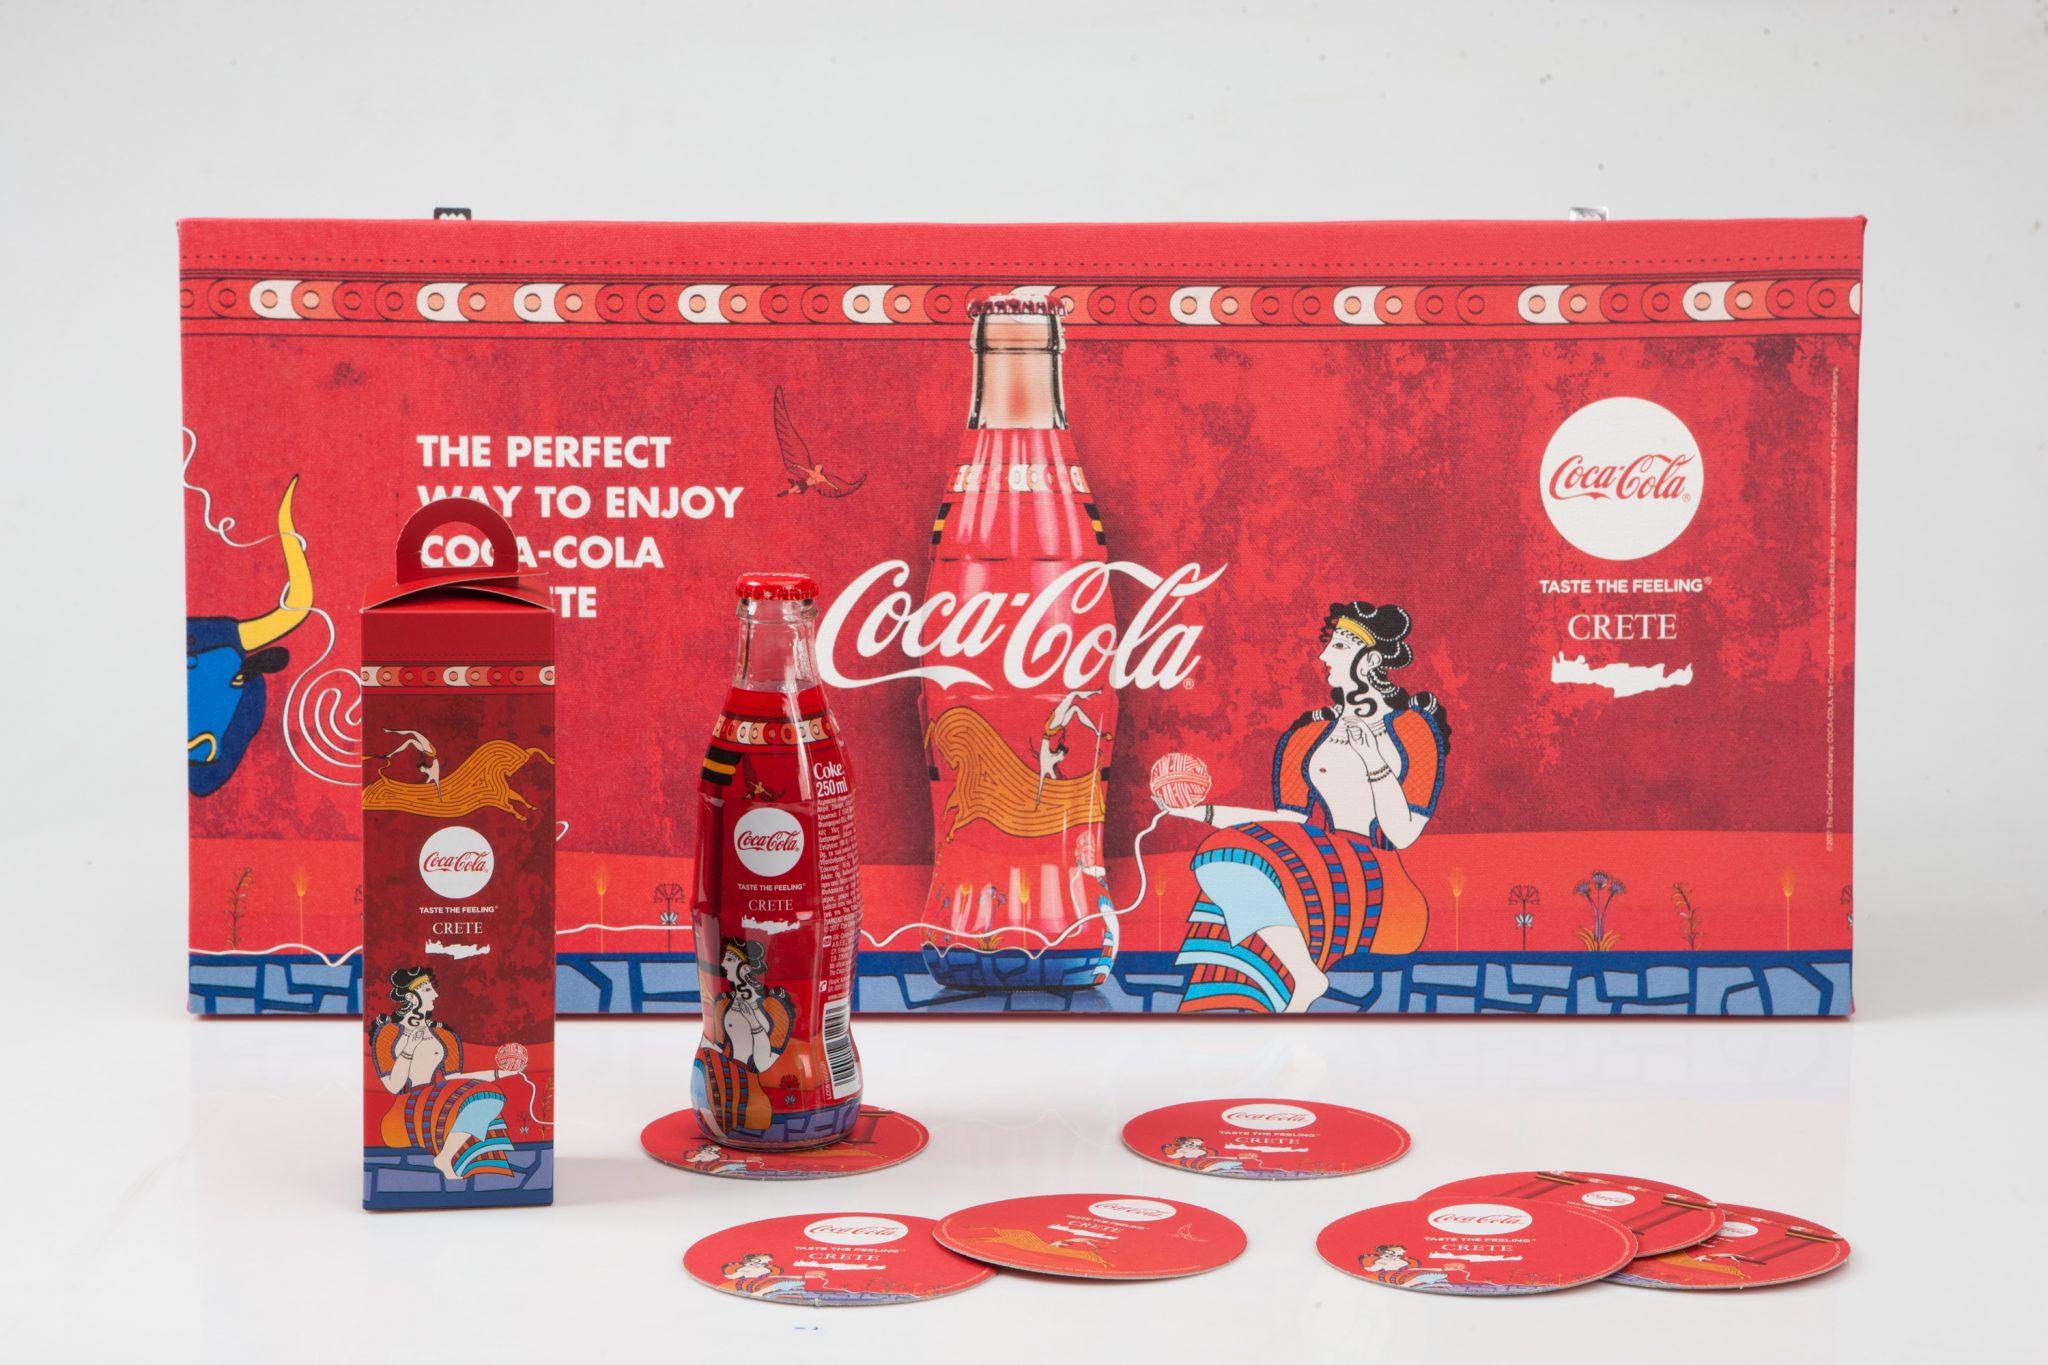 Coca-Cola Crete design.